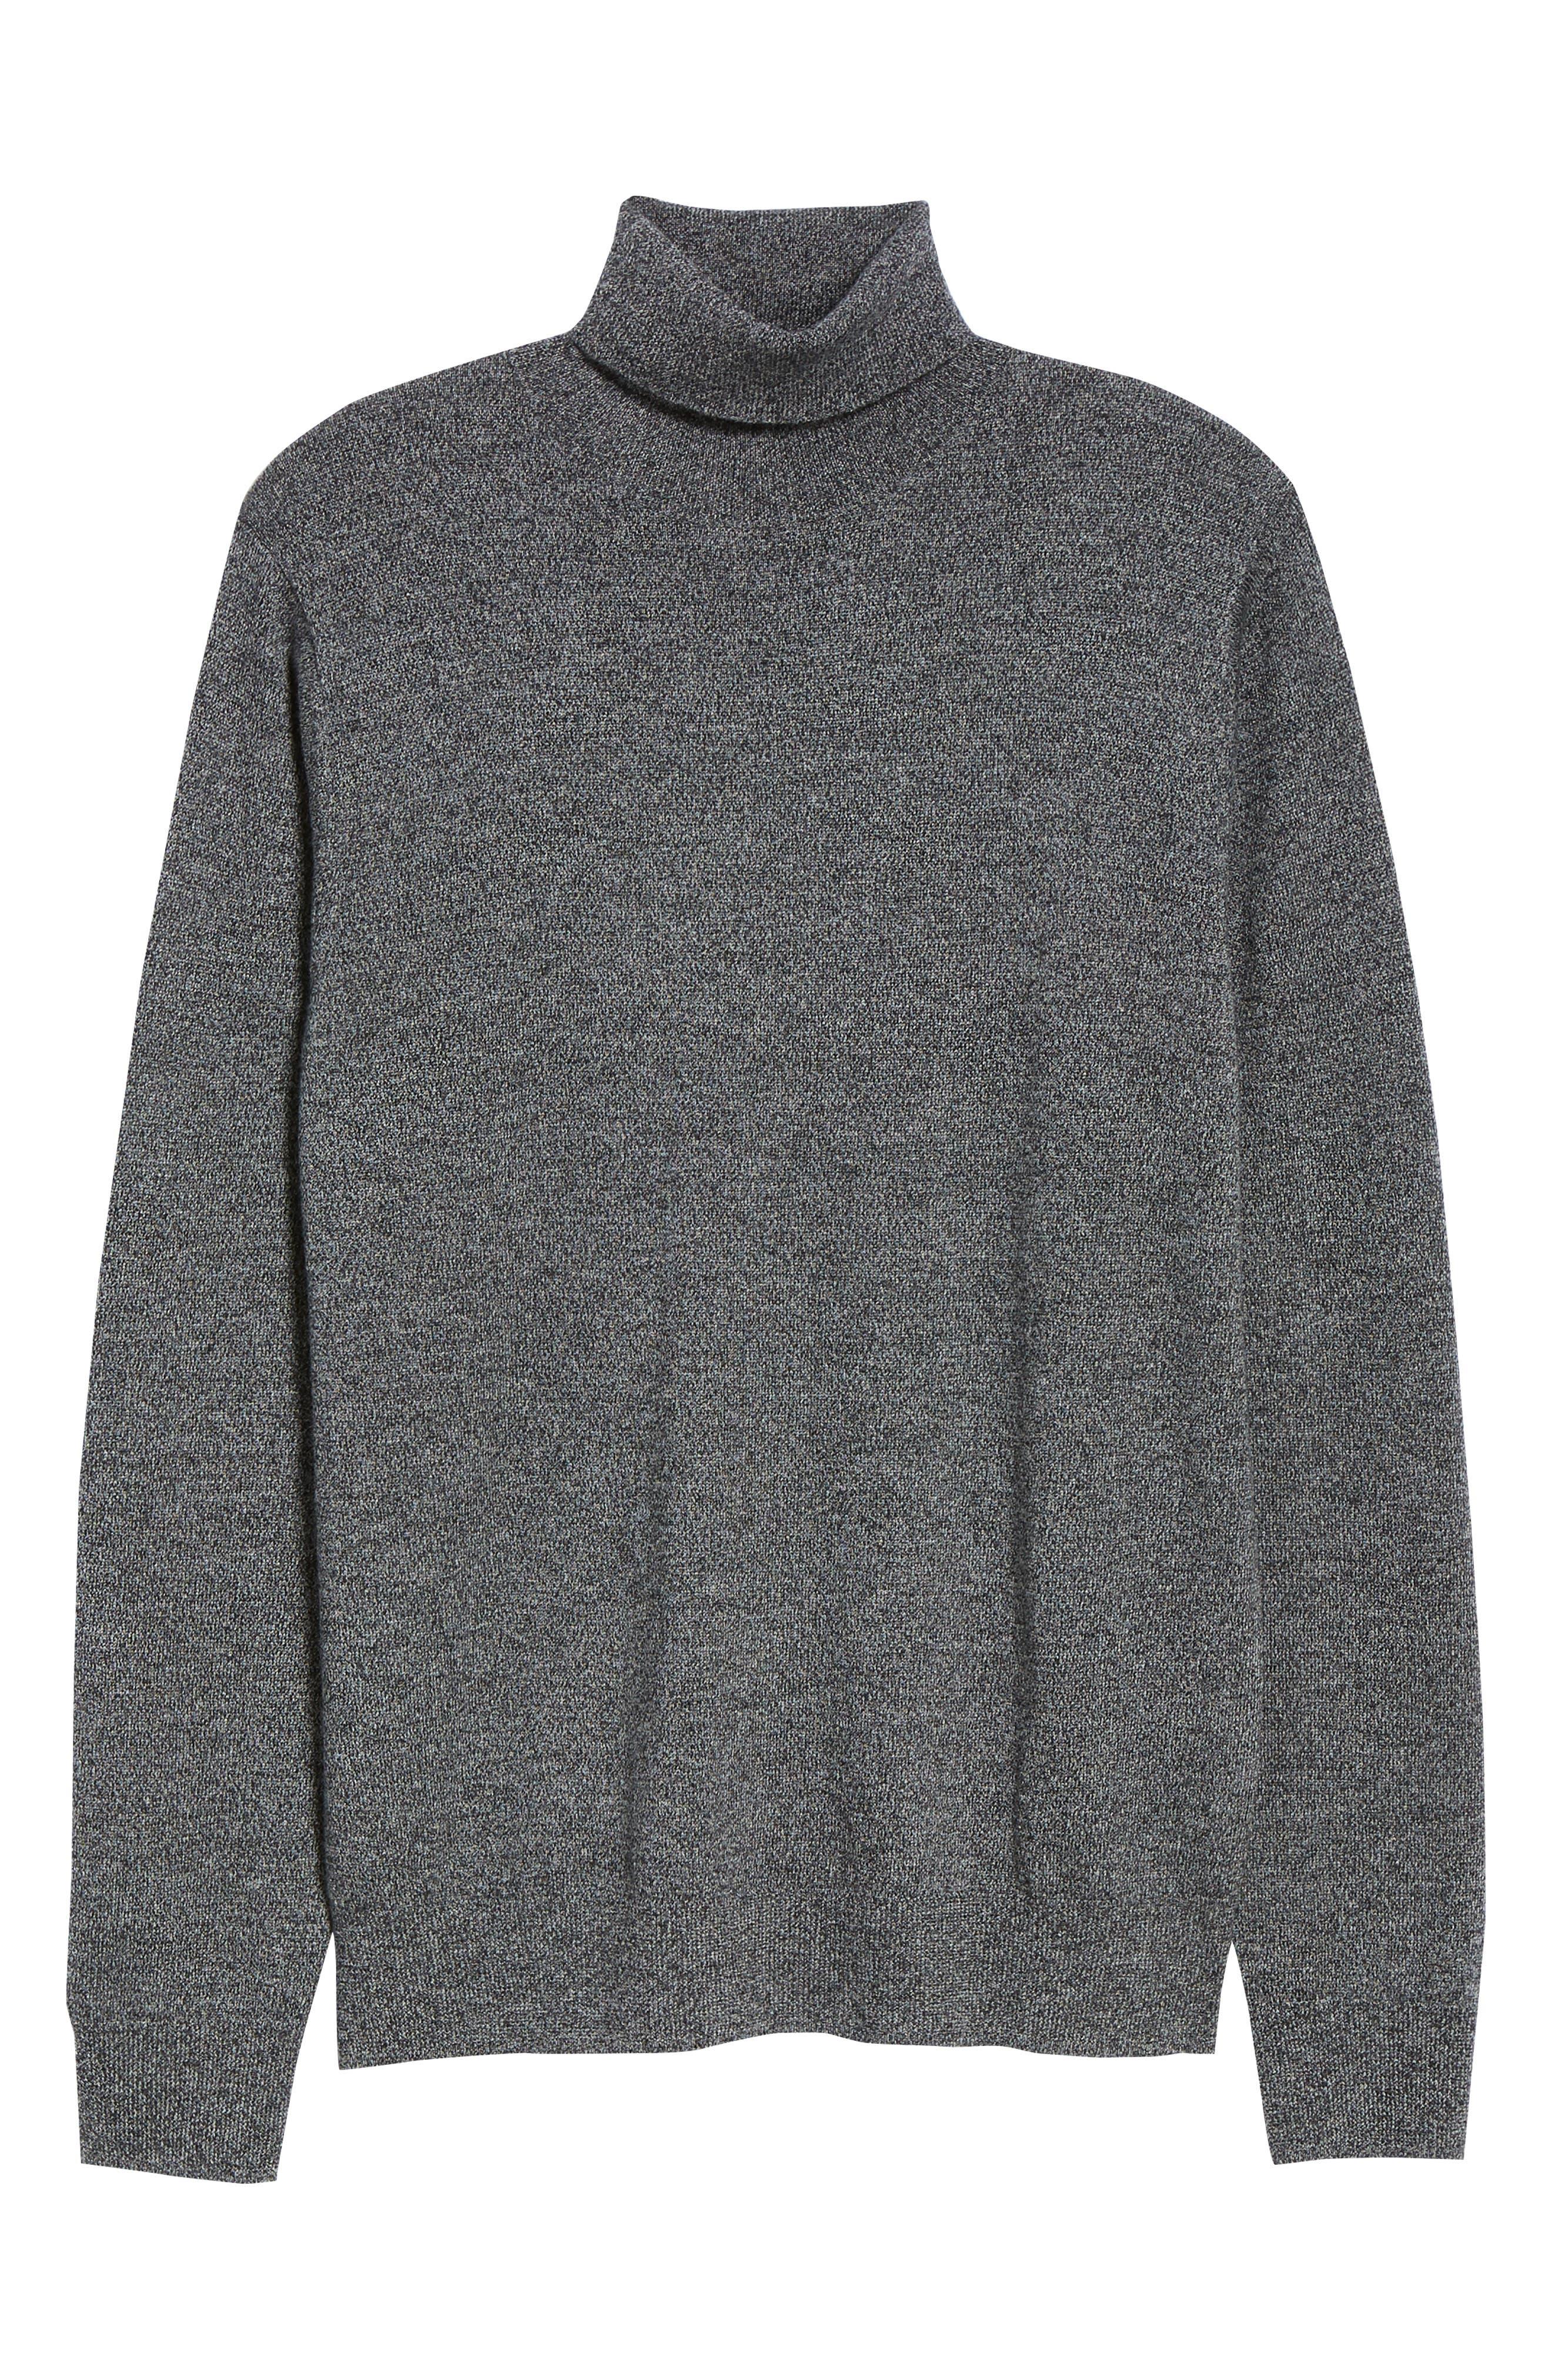 Slim Fit Turtleneck Merino Wool Sweater,                             Alternate thumbnail 6, color,                             CHARCOAL MARL